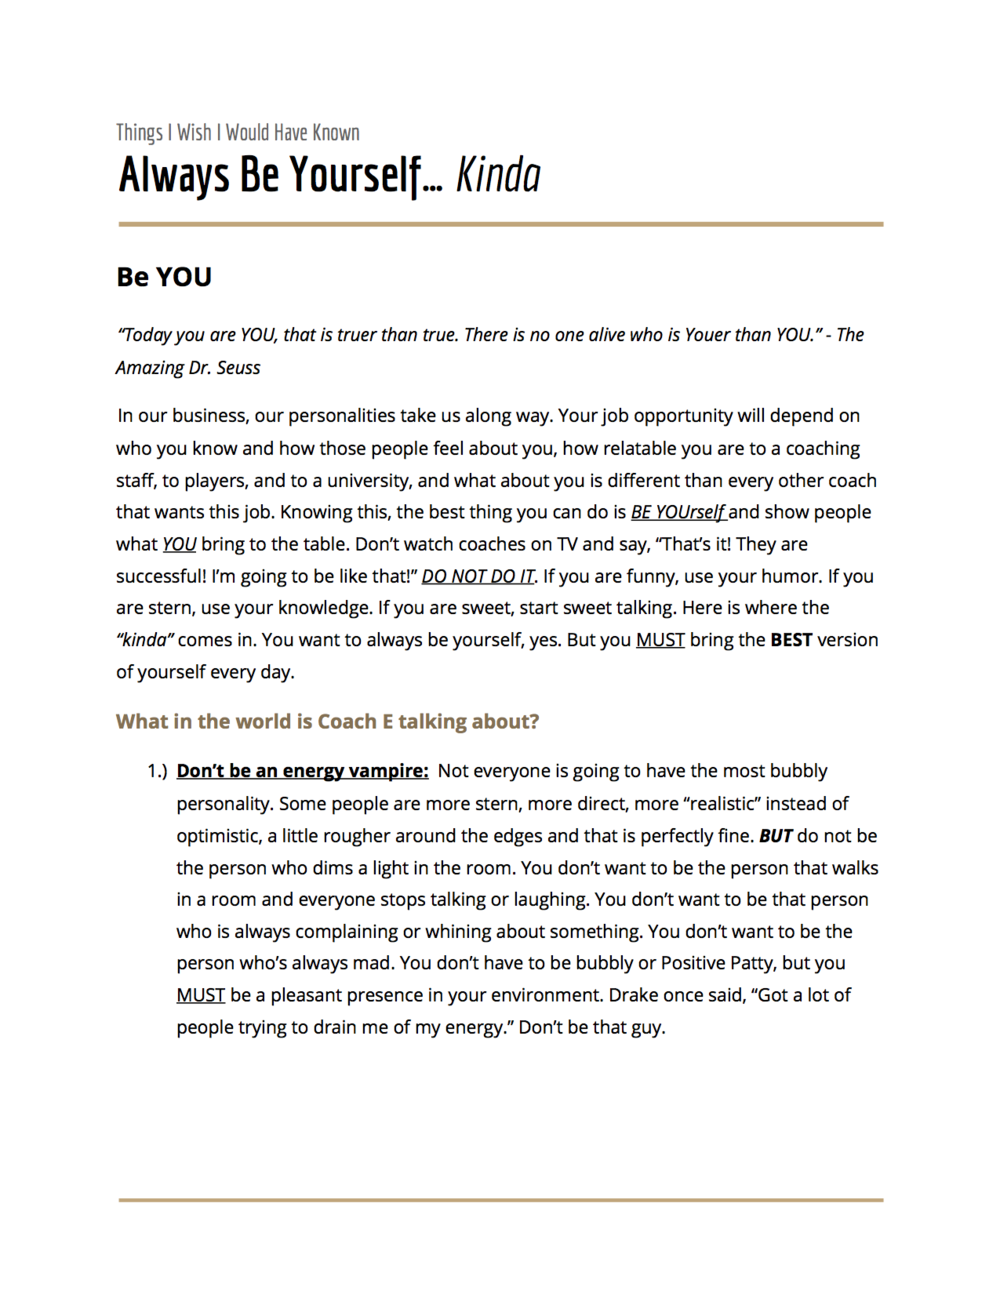 Always Be Yourself...Kinda.png